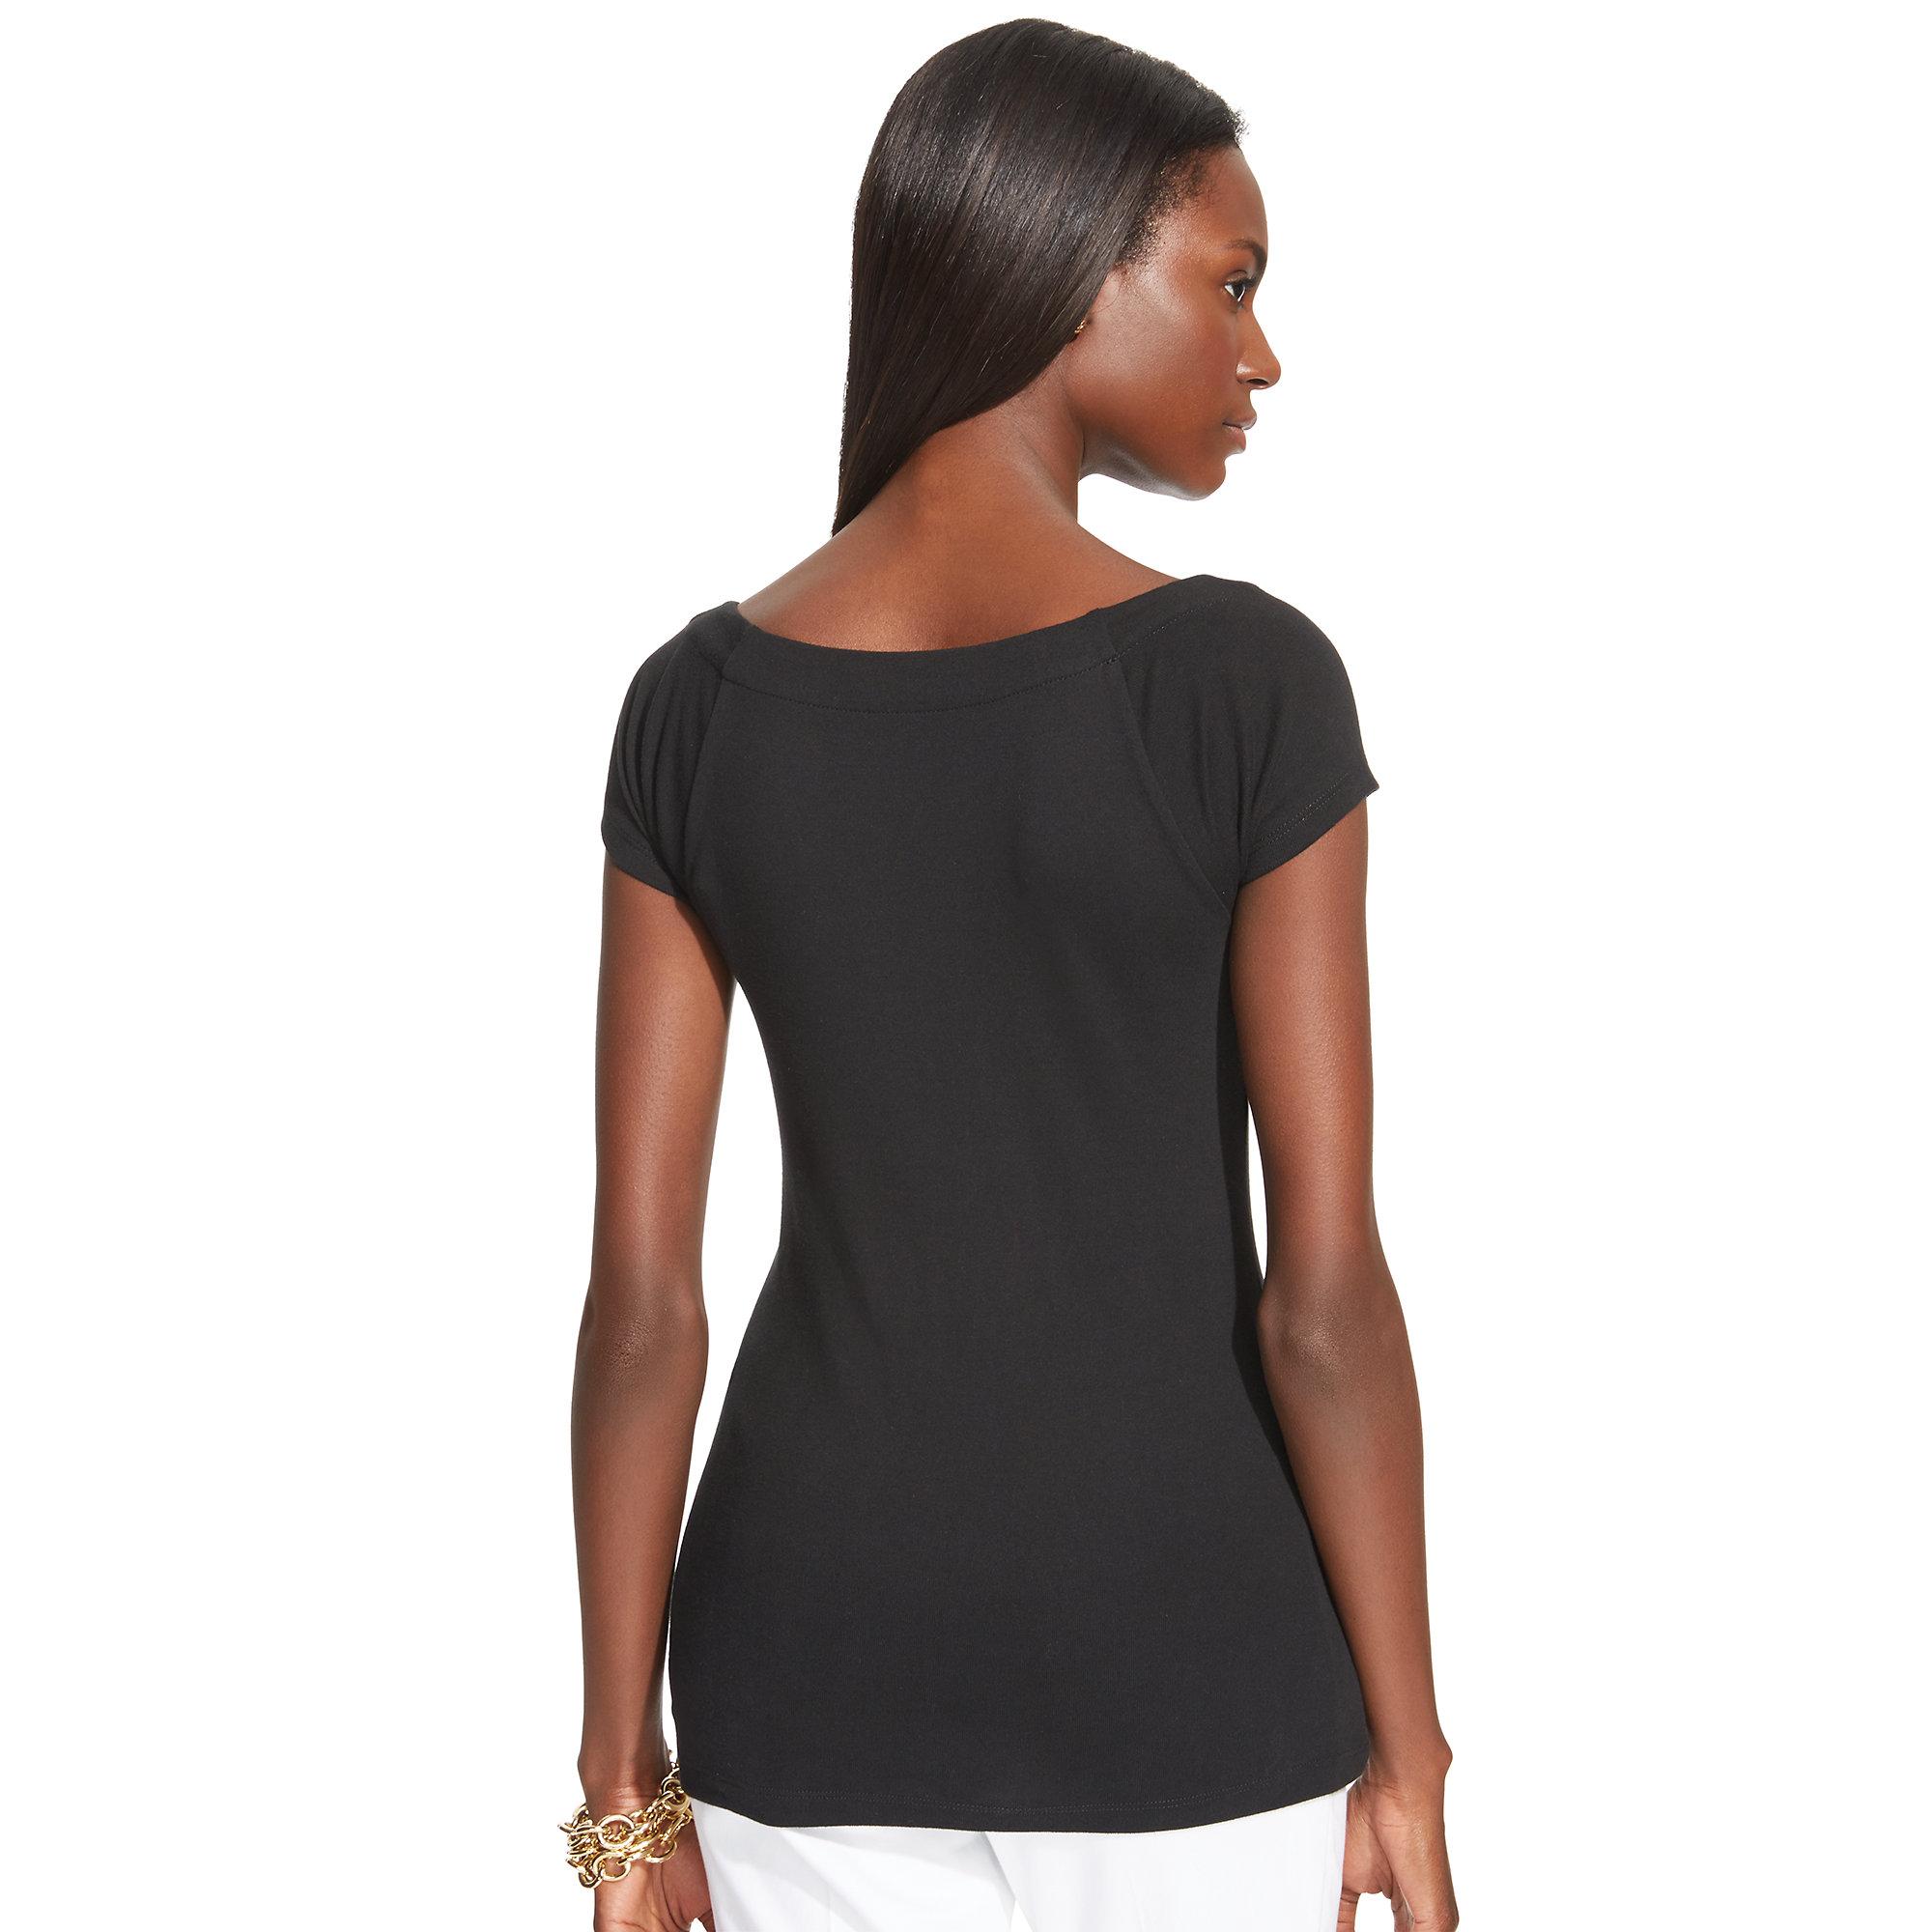 ralph lauren cap sleeved ballet neck top in black lyst. Black Bedroom Furniture Sets. Home Design Ideas